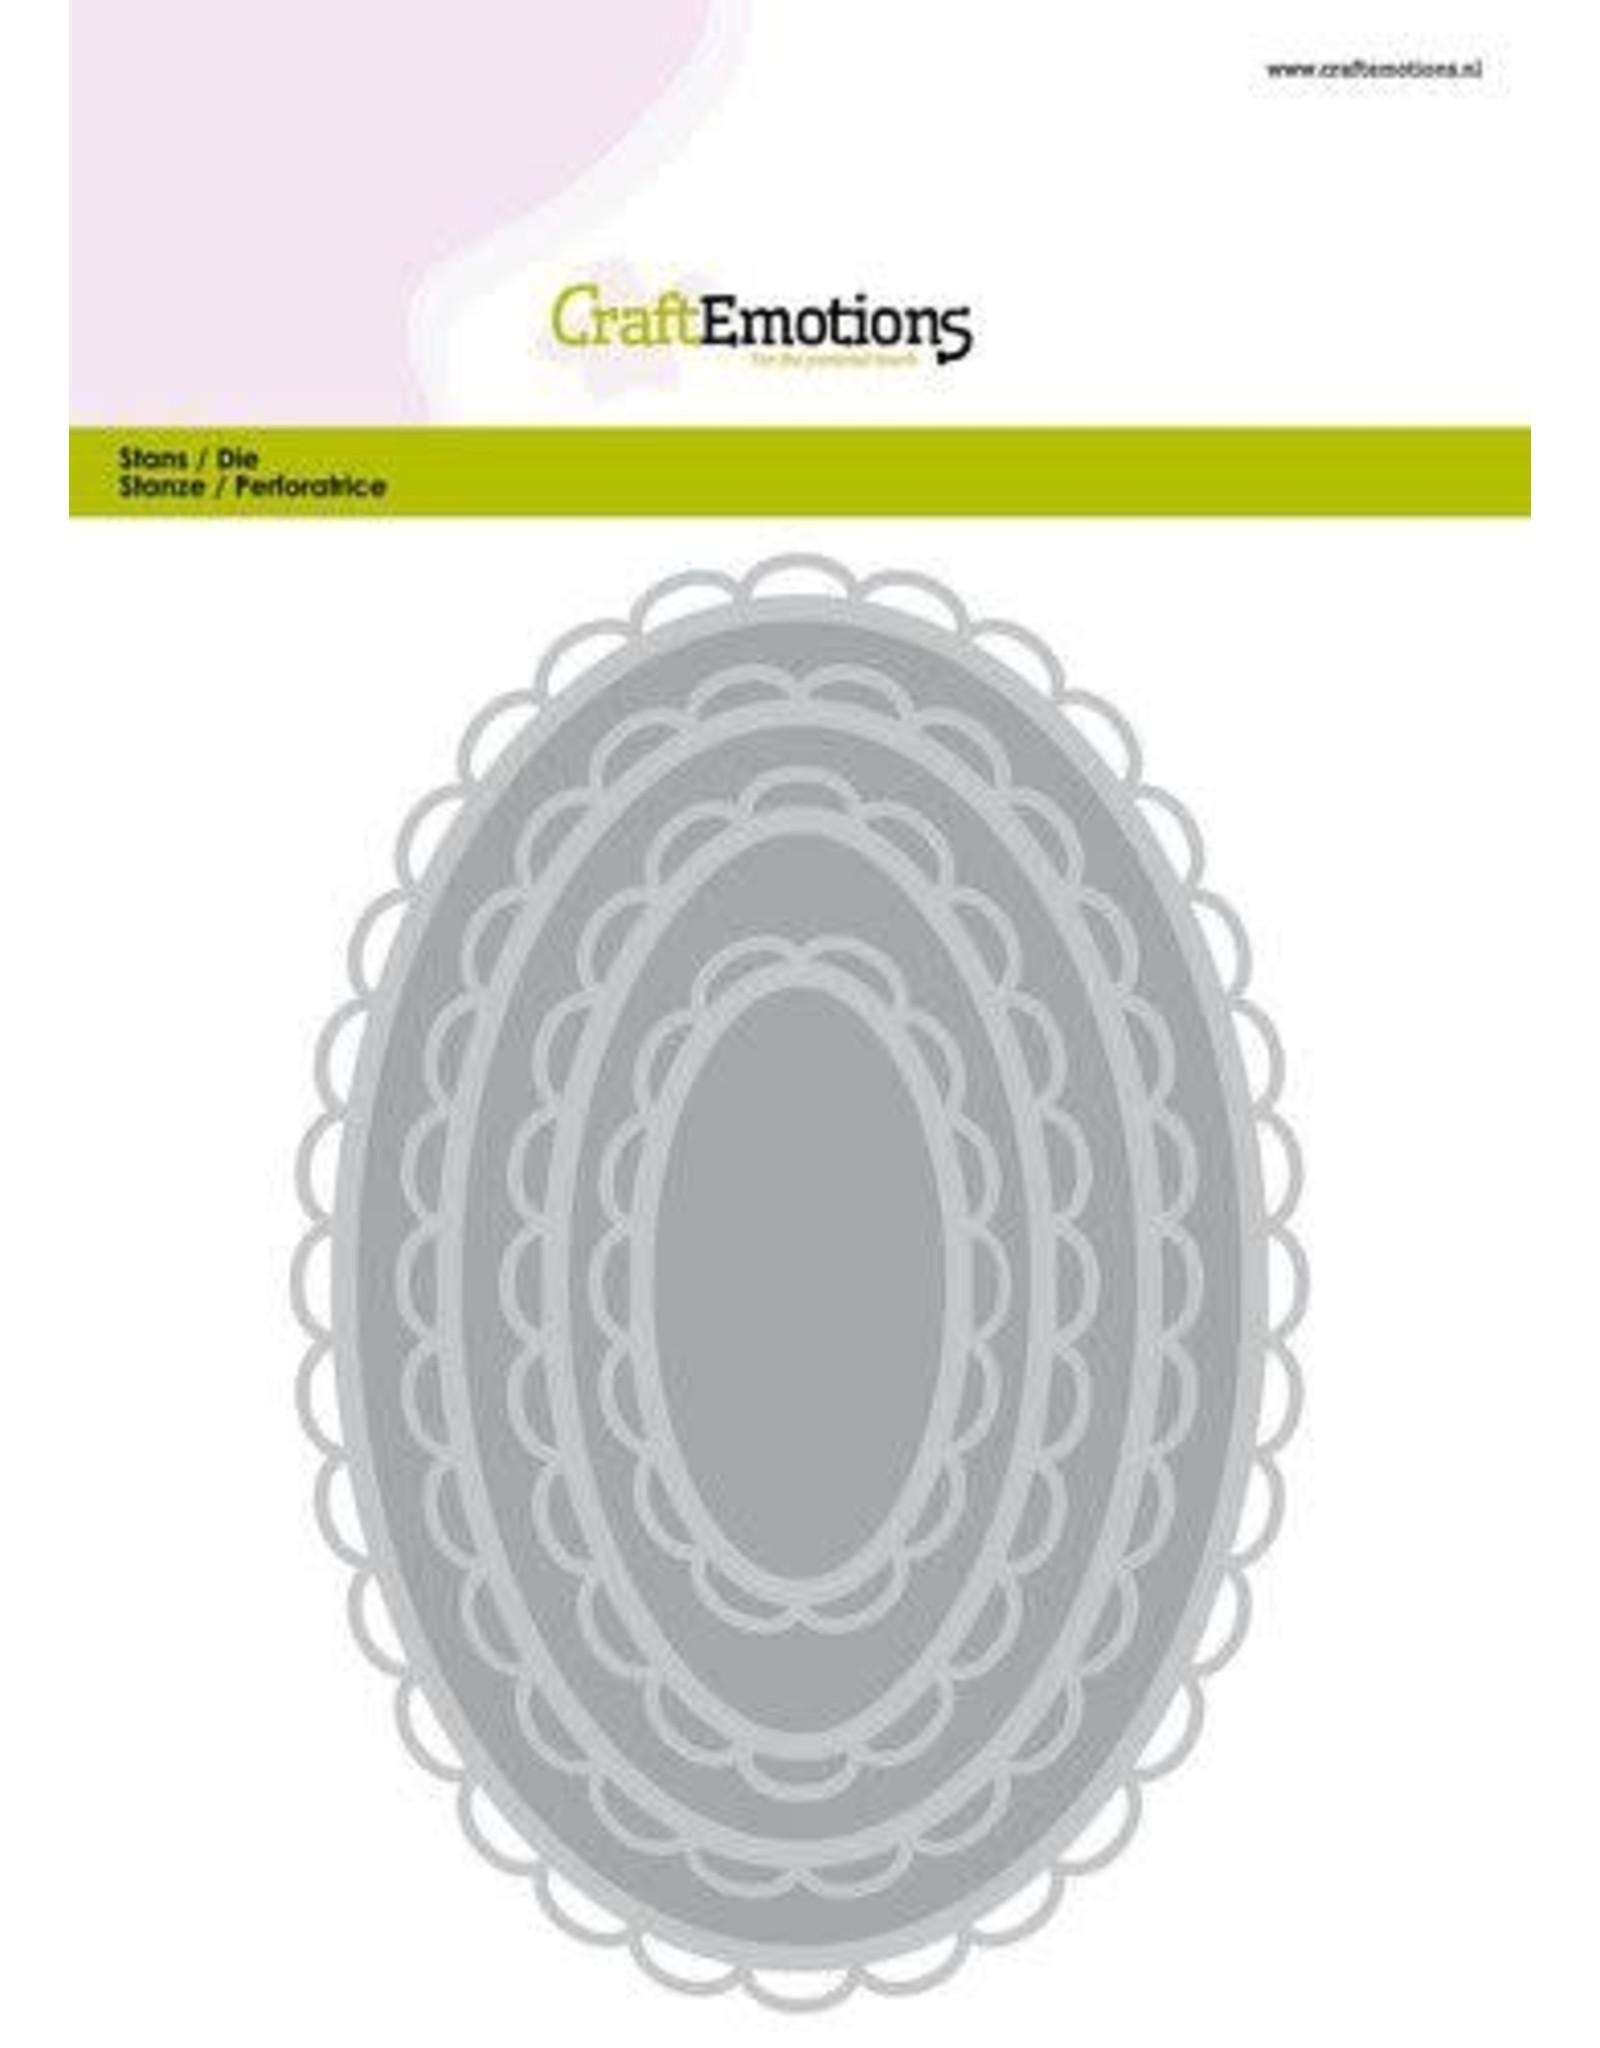 Craft Emotions CraftEmotions Big Nesting Die - ovalen scalop XL open Card 150x160 6,8-15,0cm